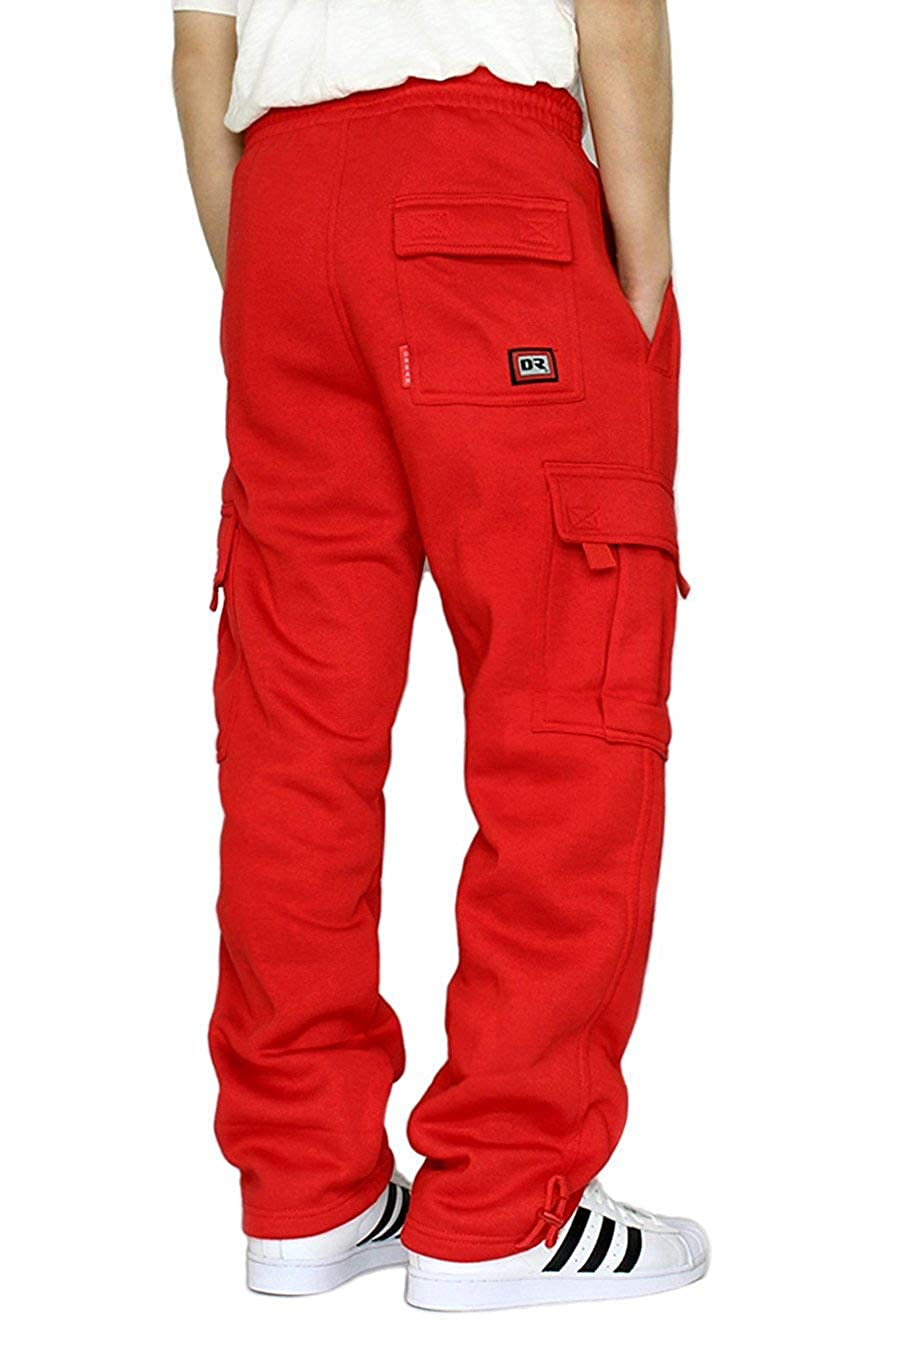 LA Gen Men's Heavyweight Fleece Cargo Sweatpants, M-5XL at Amazon Men's  Clothing store: